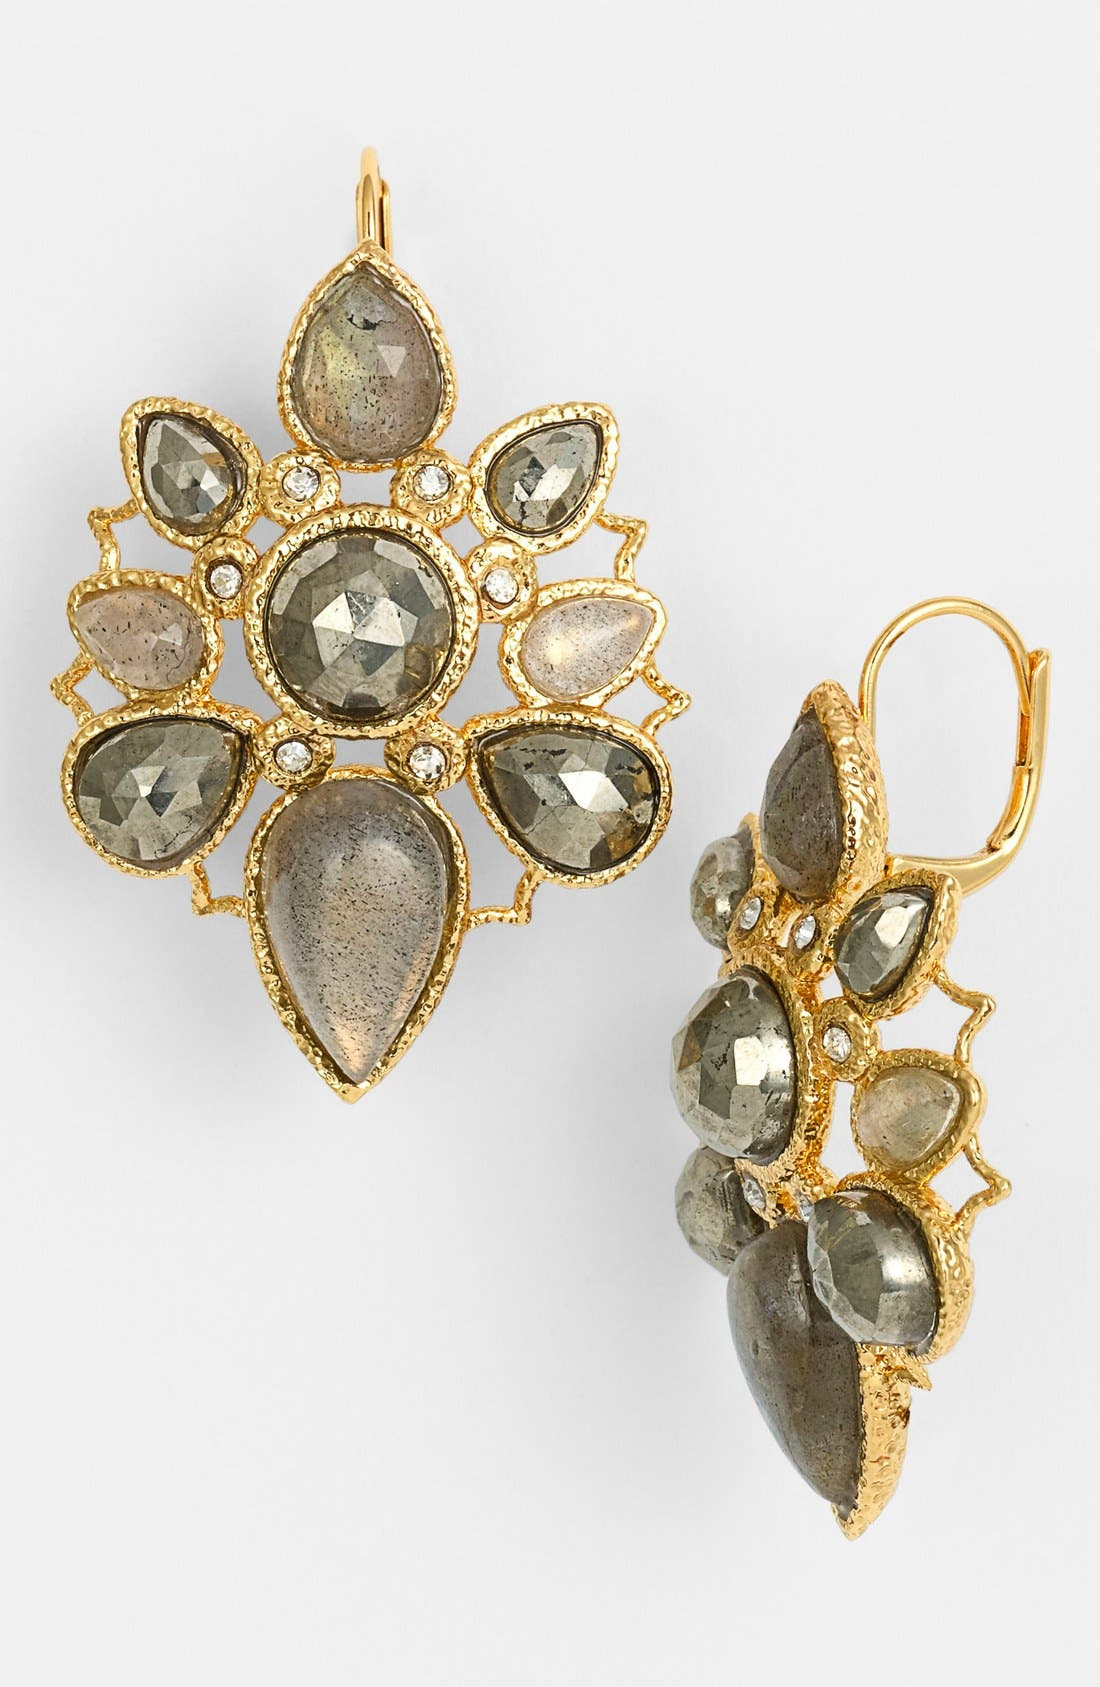 Alternate Image 1 Selected - Alexis Bittar 'Elements - Jardin de Papillon' Statement Earrings